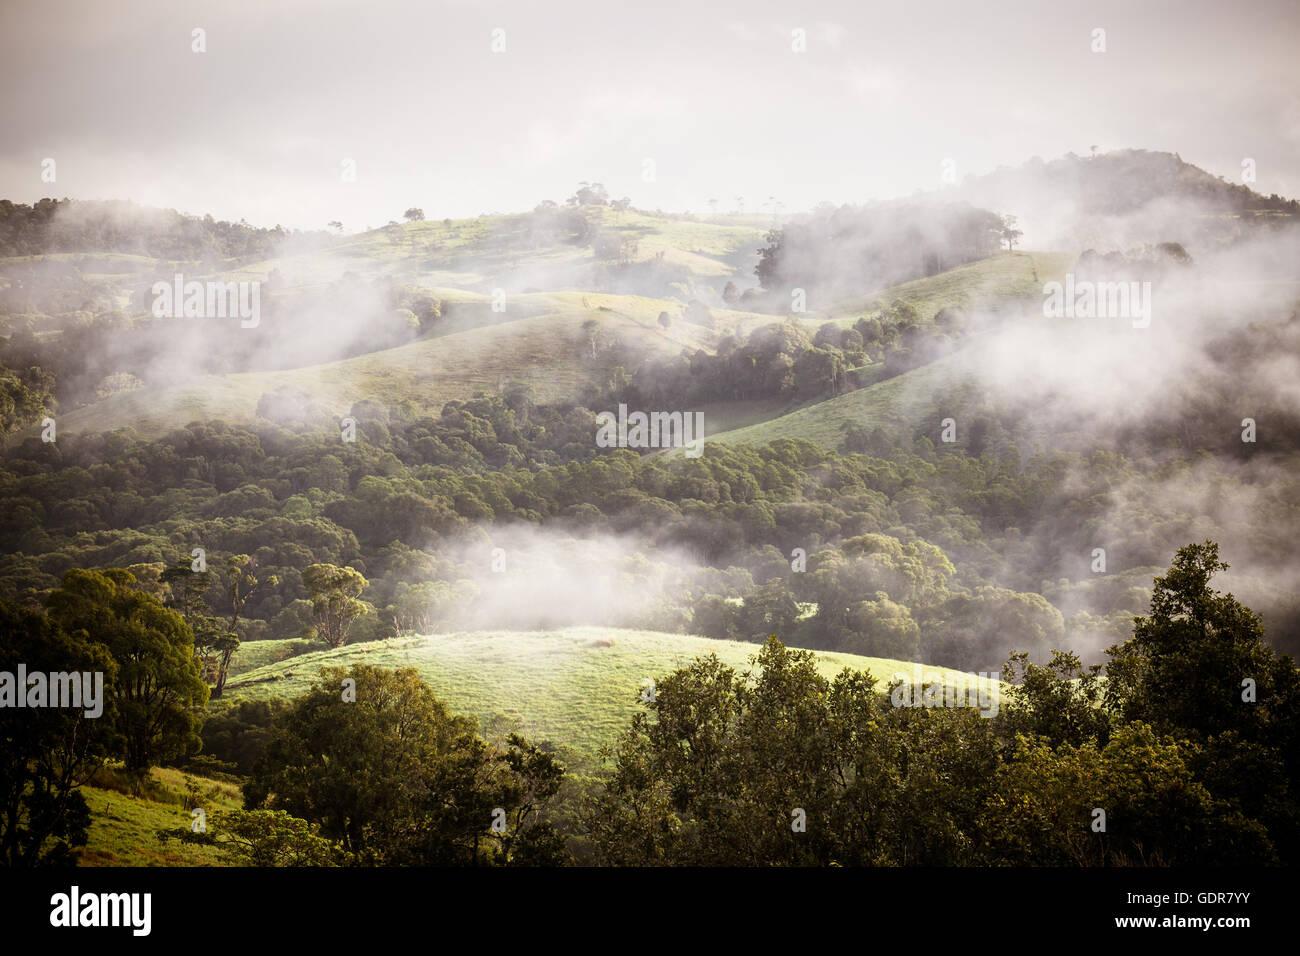 Atherton Tablelands on a Misty Morning - Stock Image